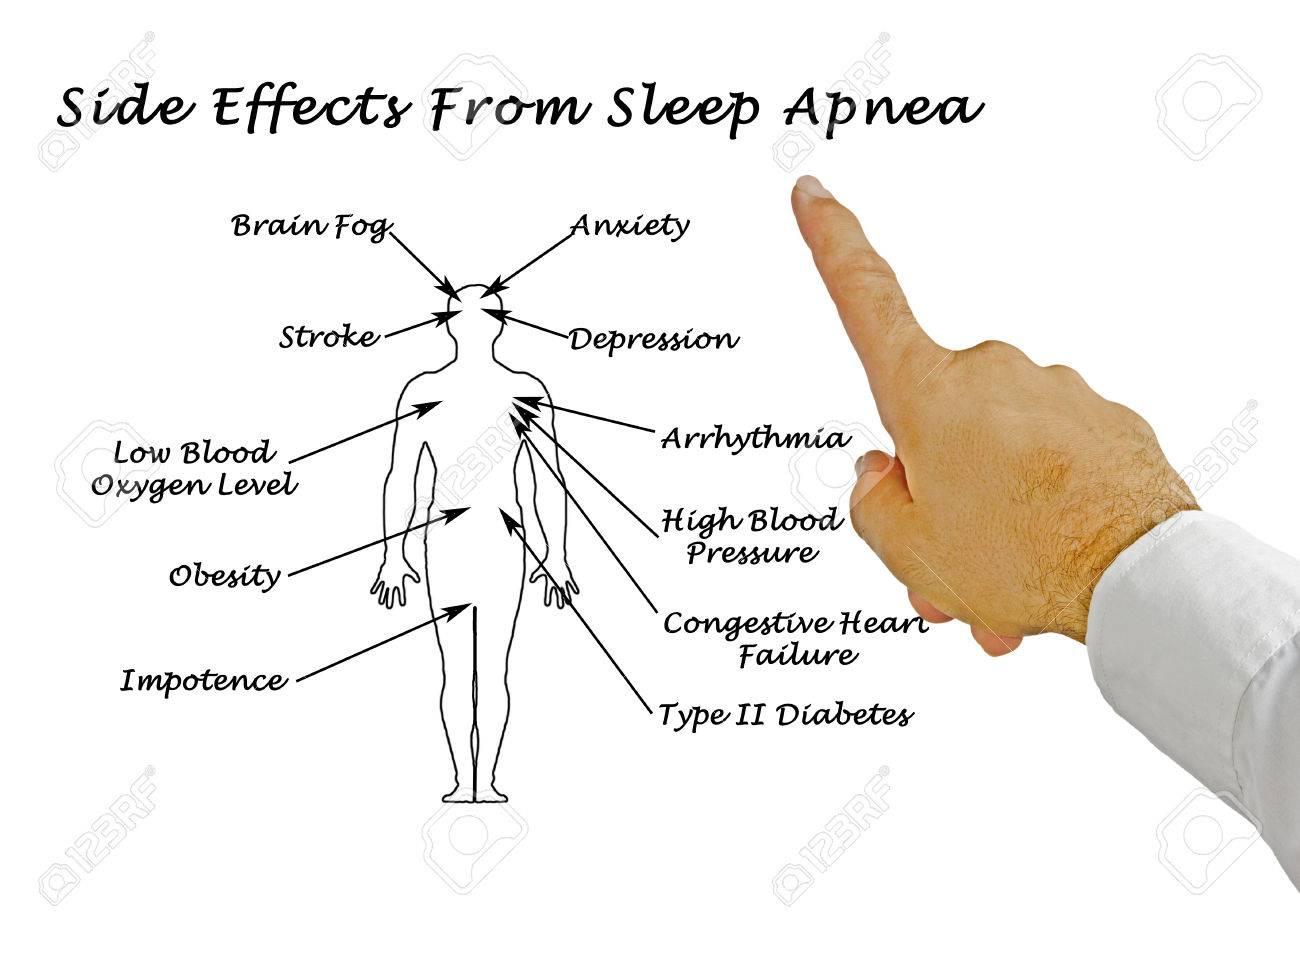 Side Effects From Sleep Apnea Stock Photo - 39668844